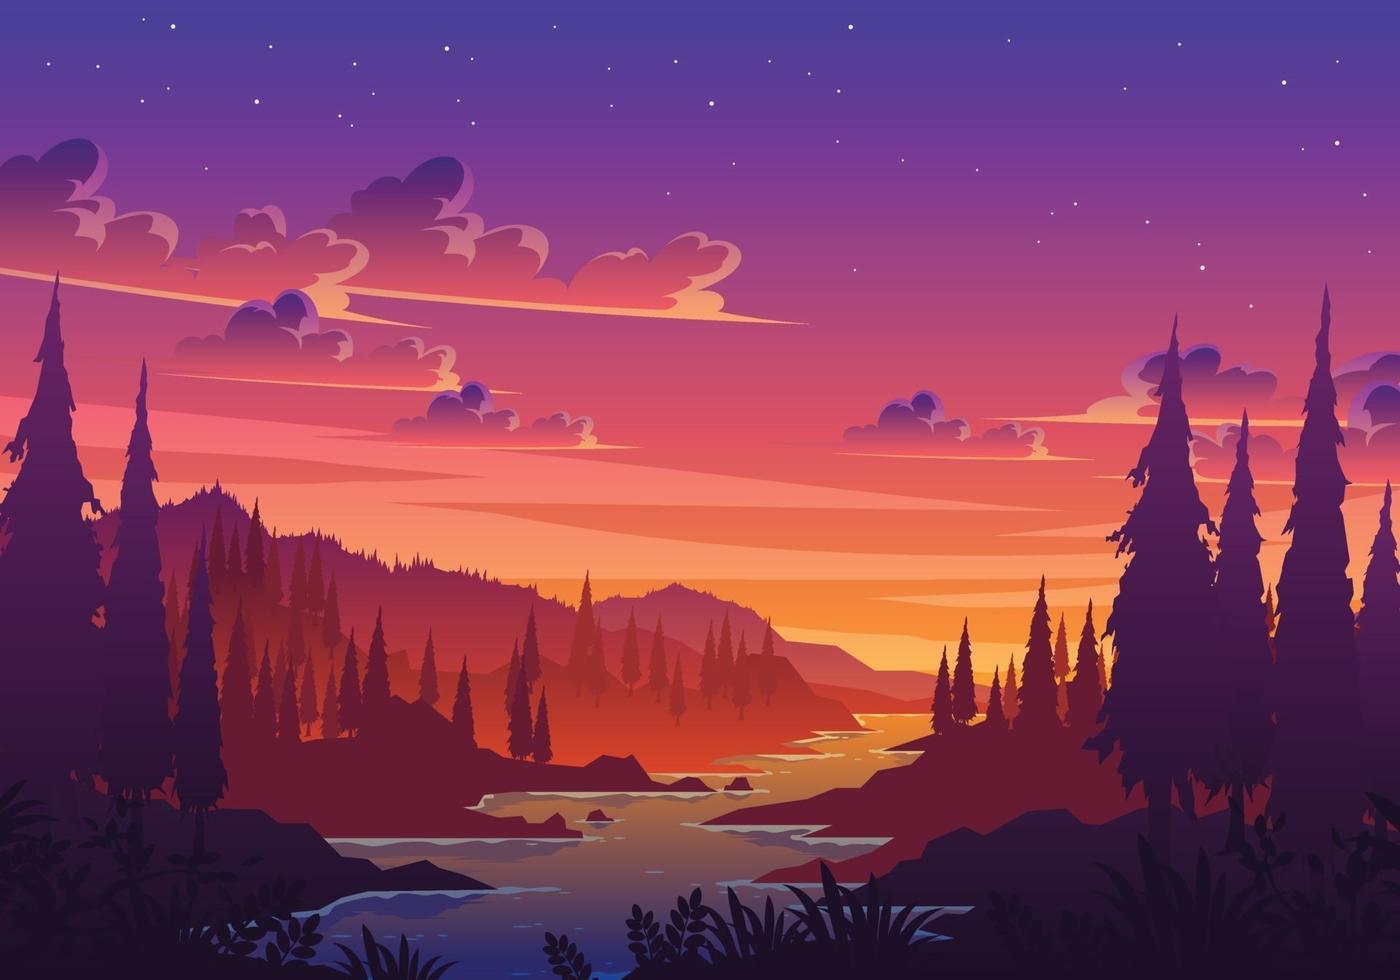 Sunset Valley Landscape Illustration vector